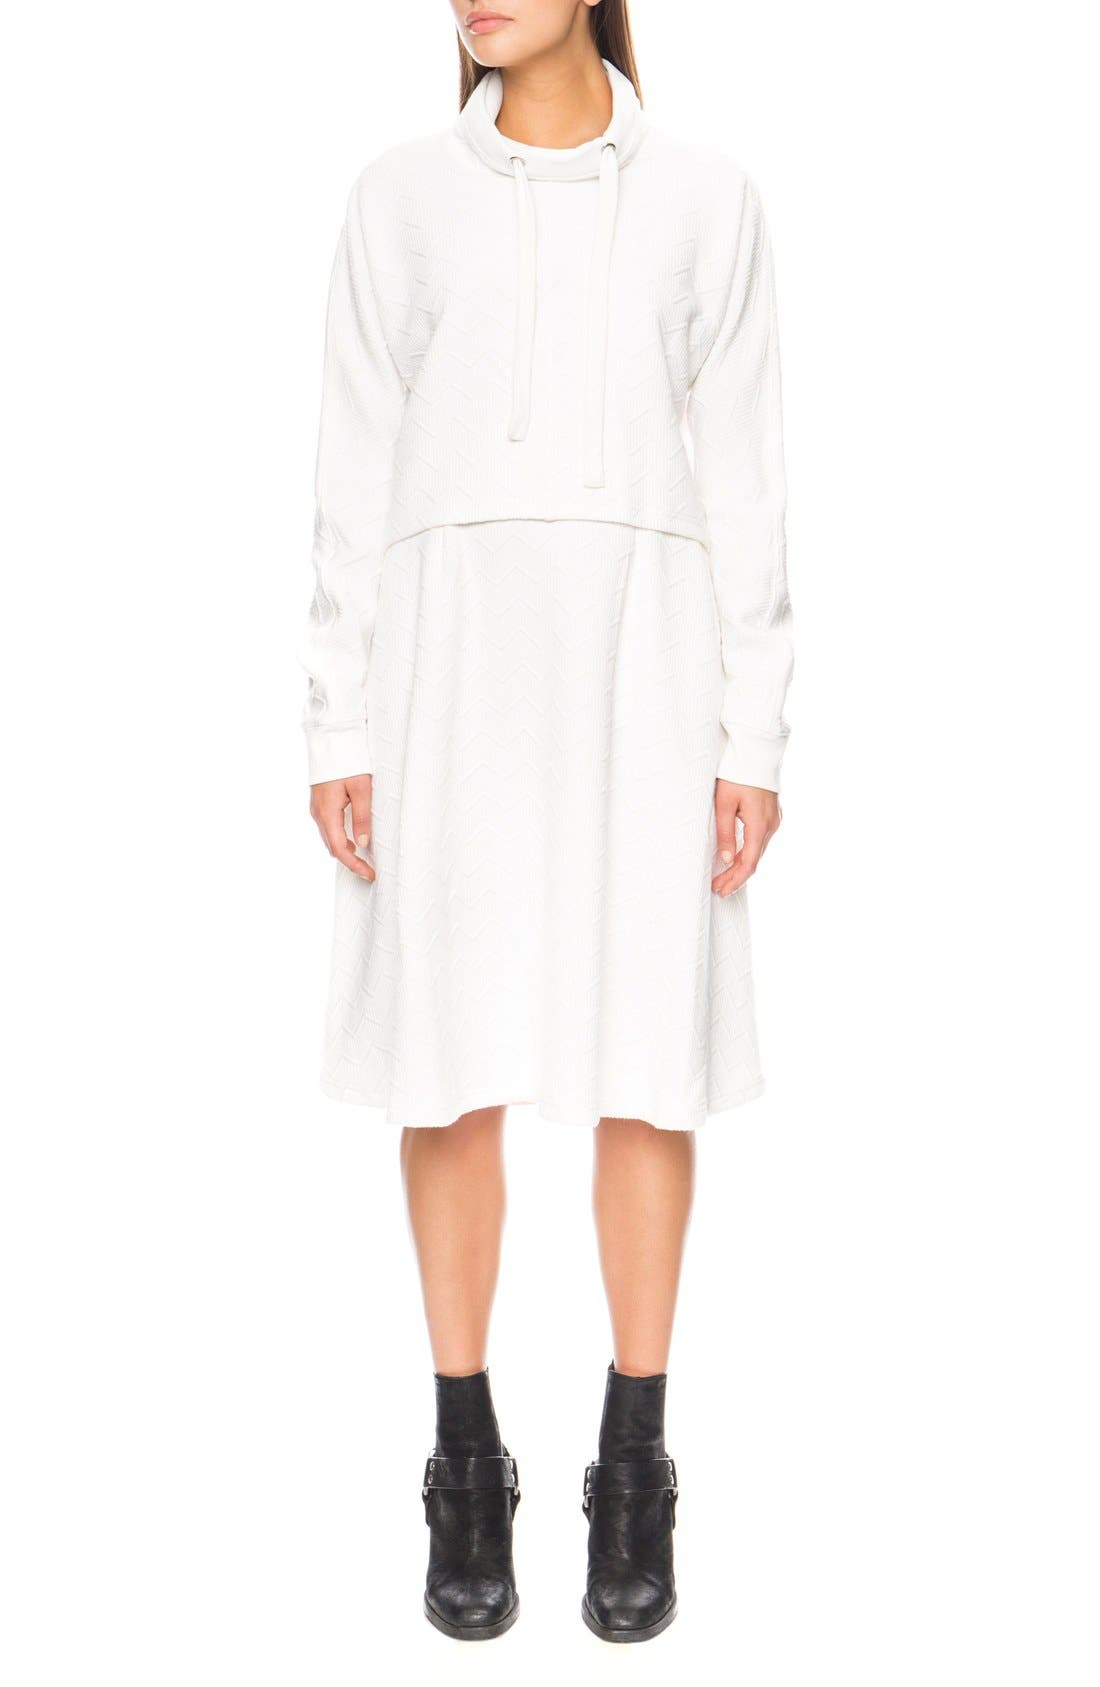 Alternate Image 1 Selected - The Fifth Label 'Passport' Midi Skirt